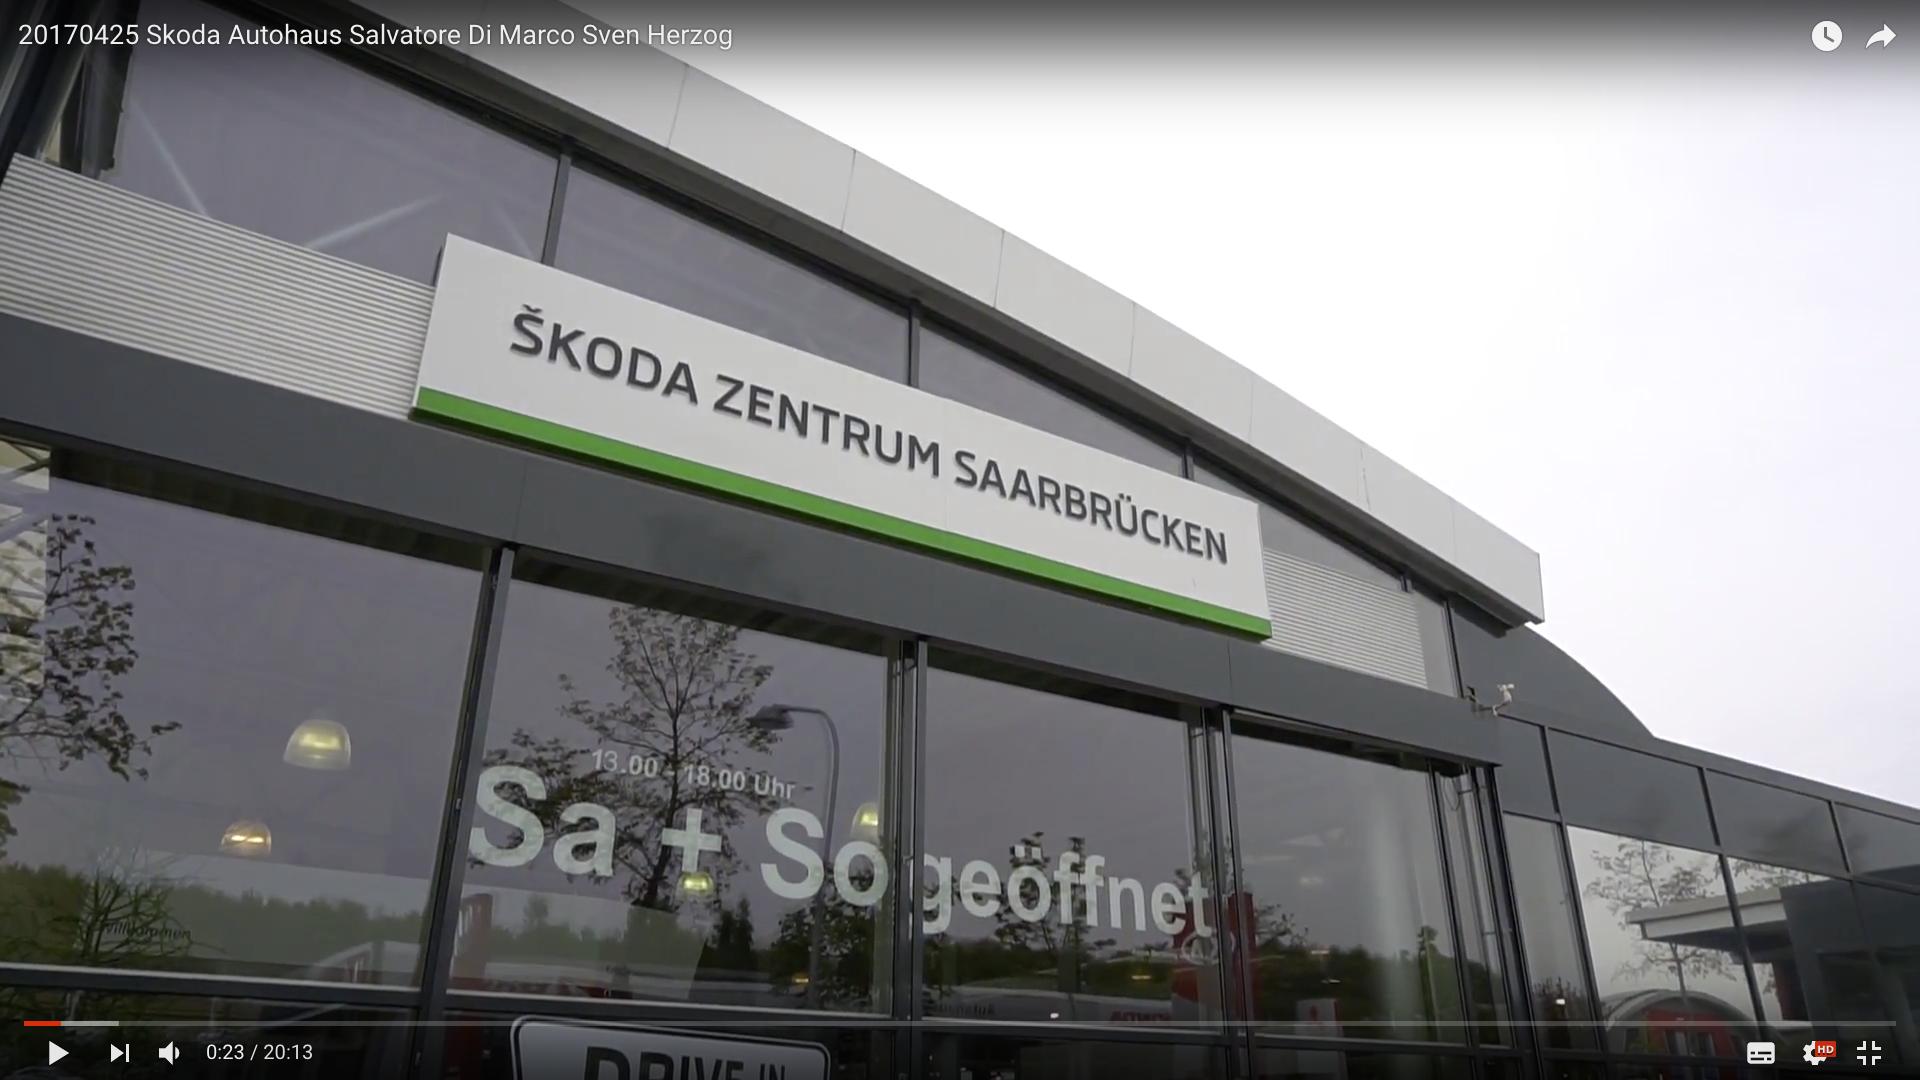 2017 Rittersbacher Skoda Zentrum Saarbrücken Skoda Zentrum Saarbrücken_MSM_MEDIEN_SAAR_MOSEL_SAARLAND_FERNSEHEN_1_ED_SAAR